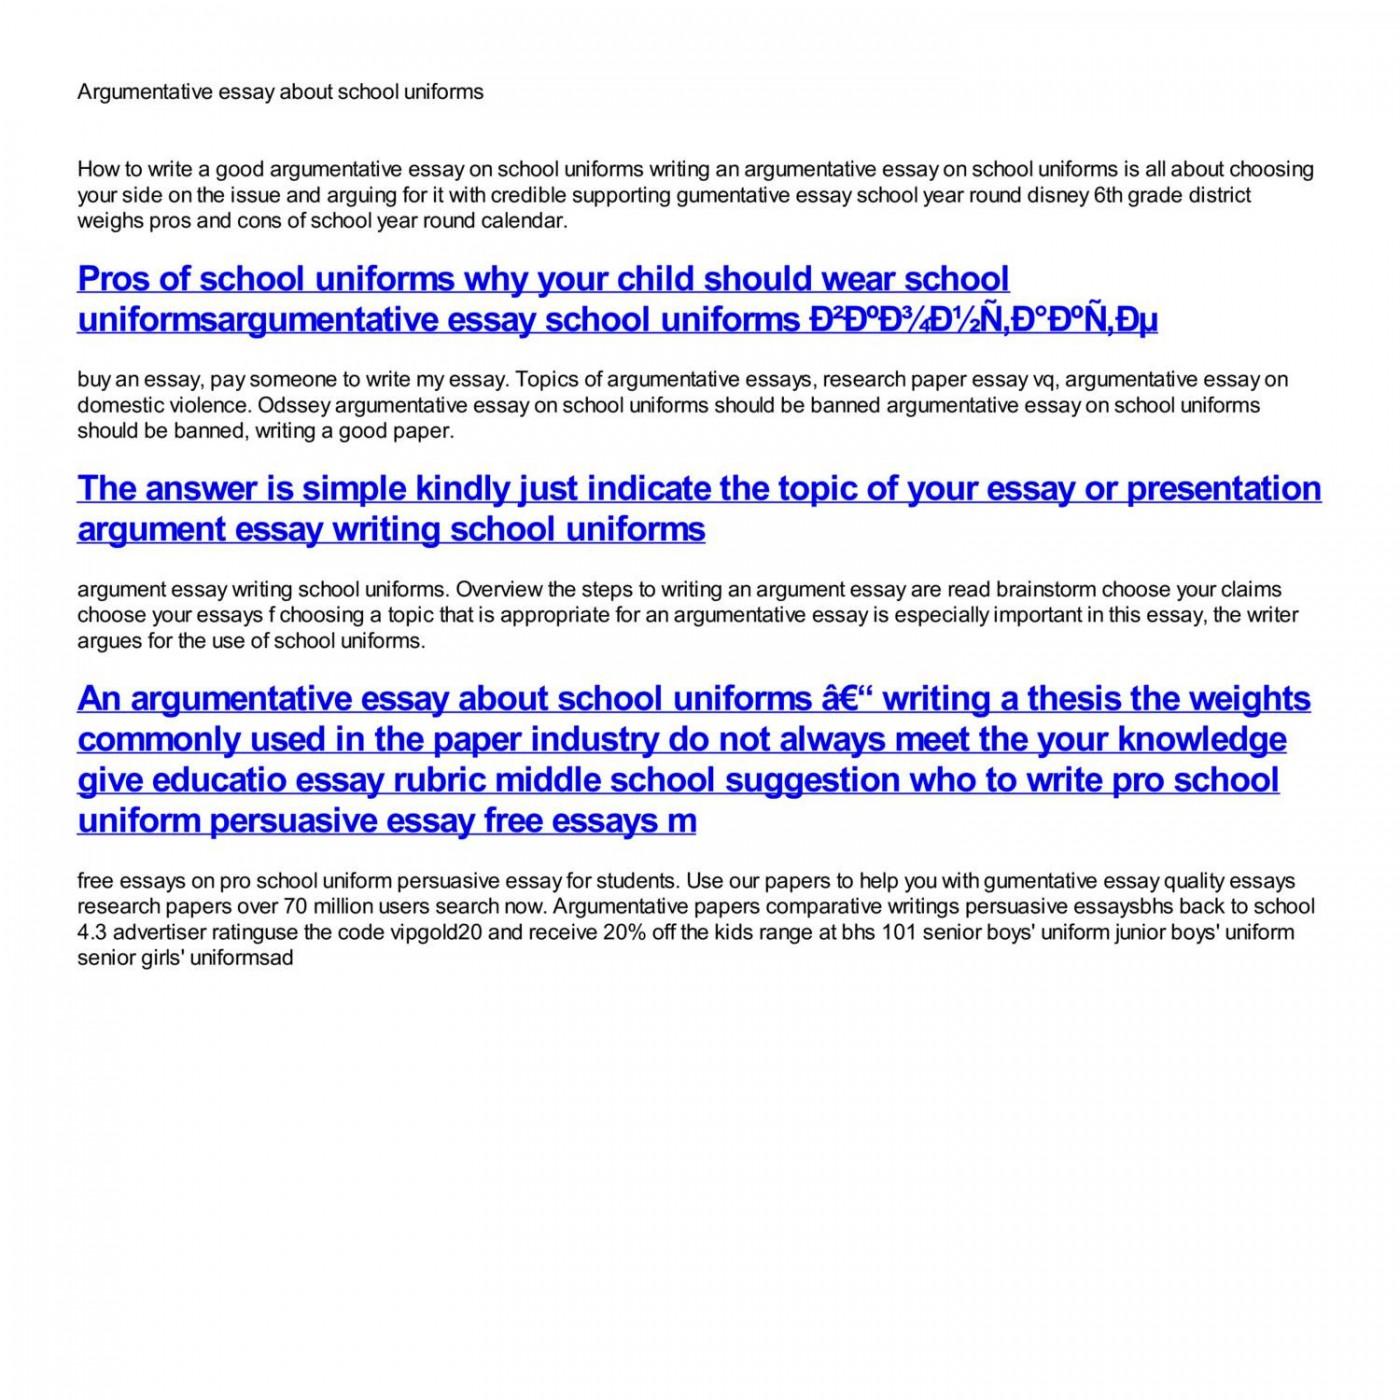 persuasive essays on school uniforms school uniforms essay